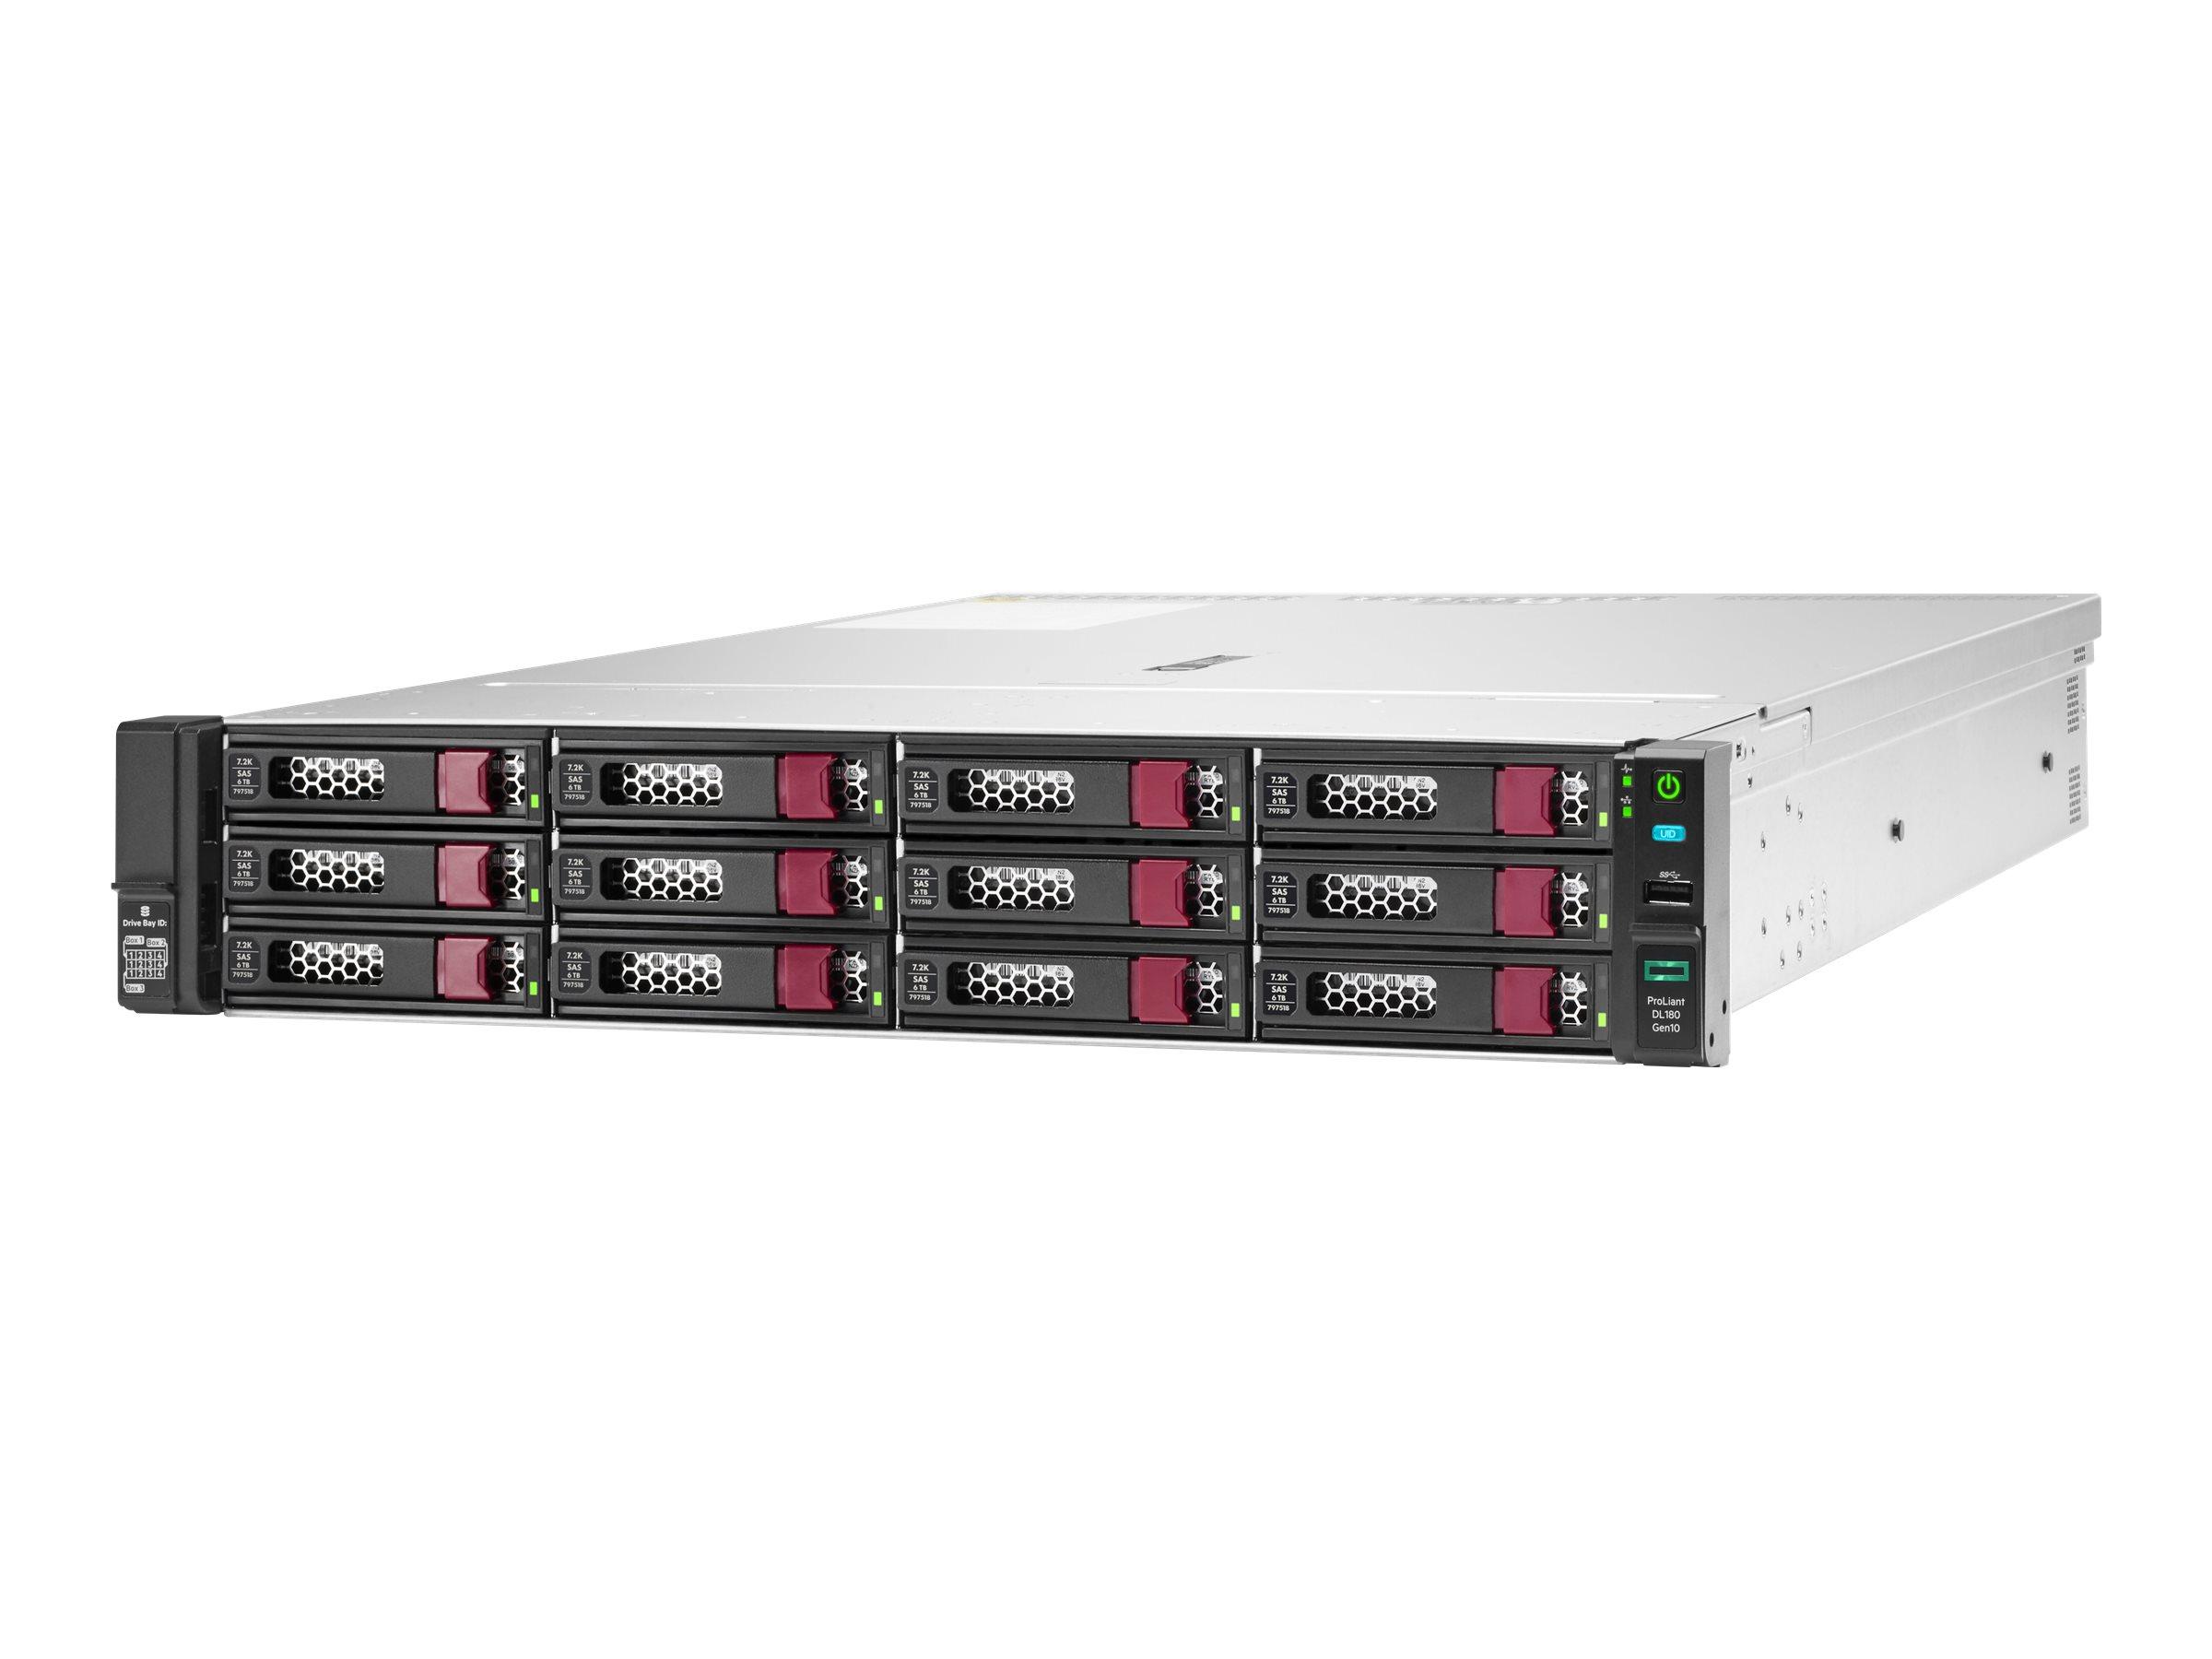 HPE ProLiant DL180 Gen10 SMB - Server - Rack-Montage - 2U - zweiweg - 1 x Xeon Silver 4208 / 2.1 GHz